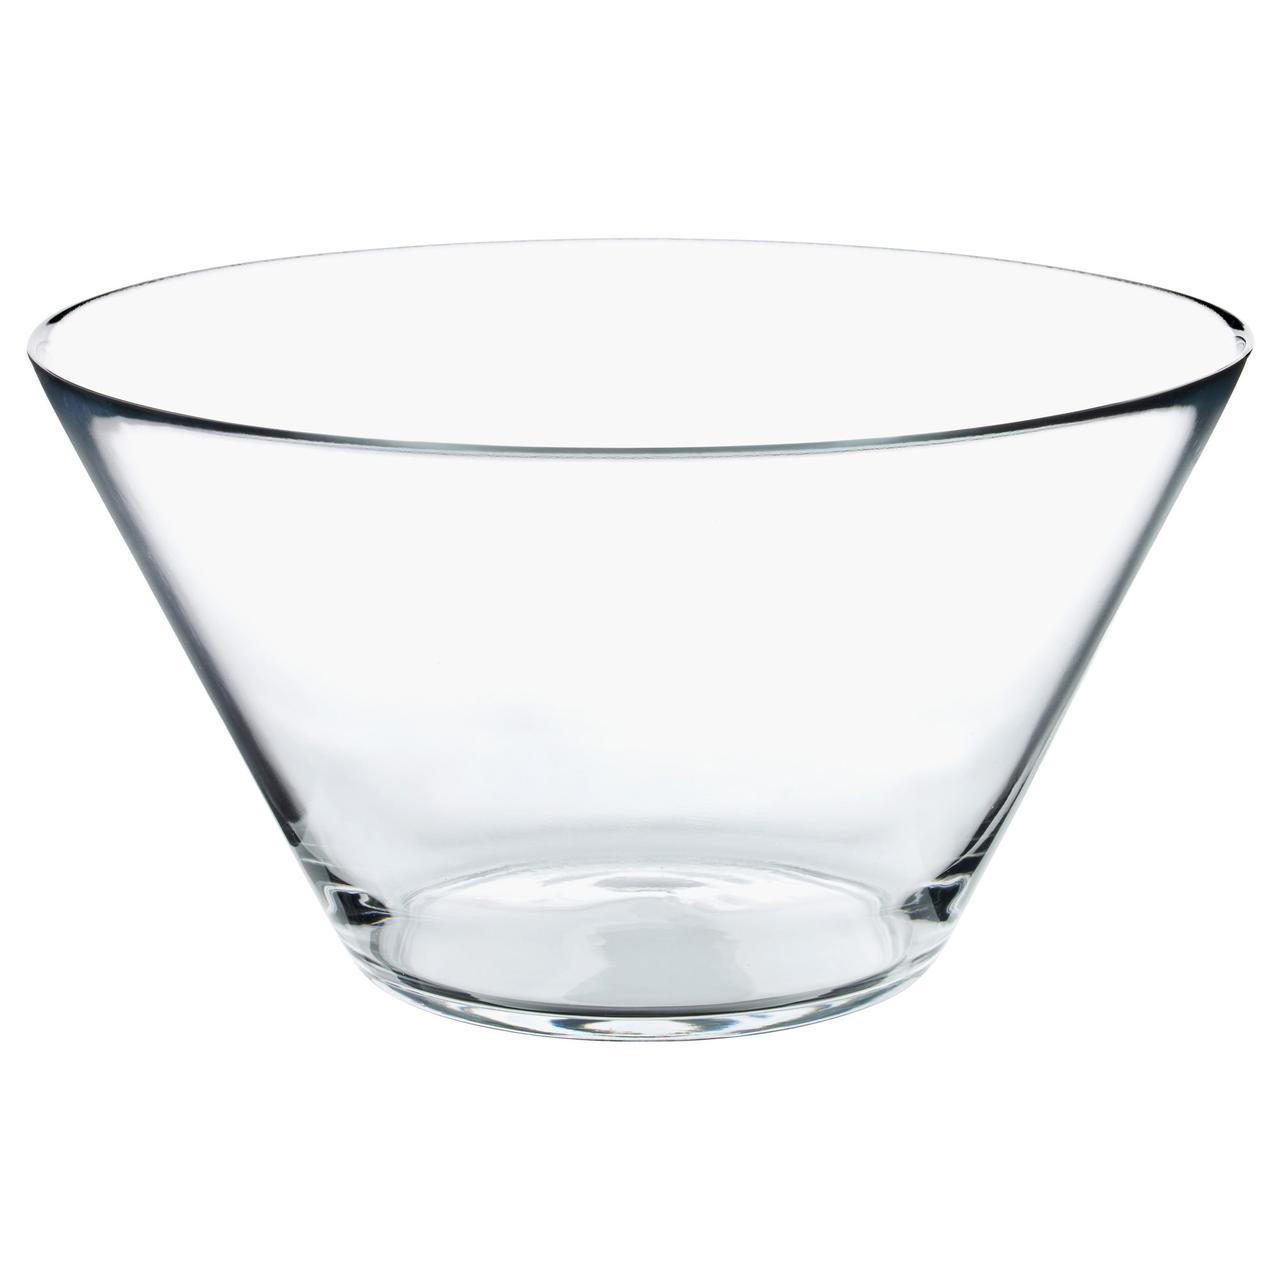 ✅ IKEA TRYGG (201.324.53) Миска, прозрачное стекло